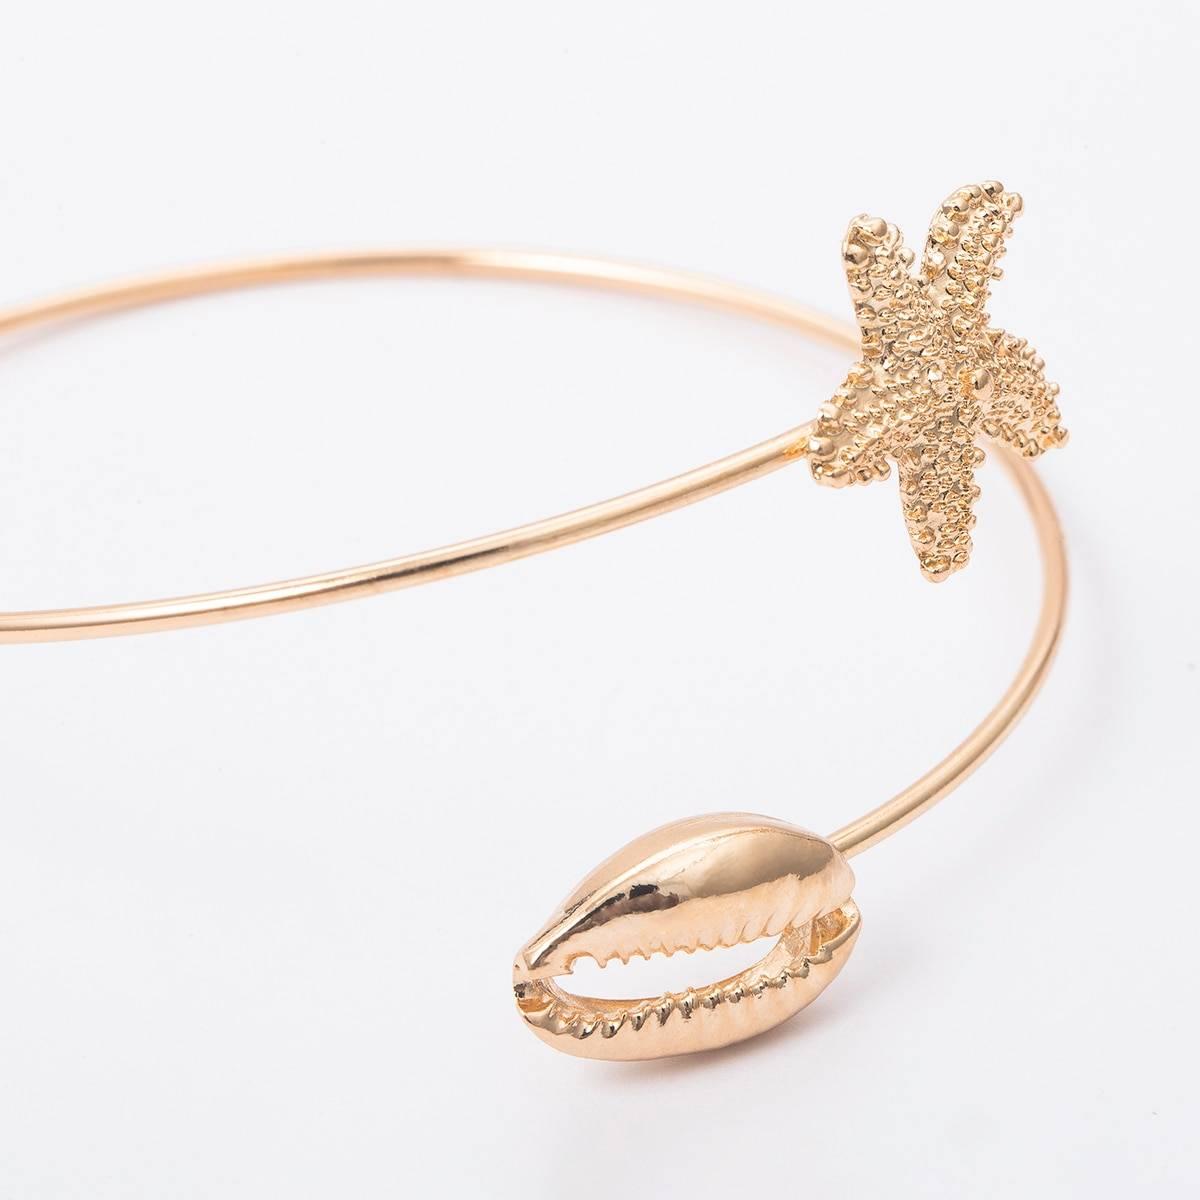 Bohemian Gold Color Starfish / Shell Arm Bangle for Women Body Jewelry cb5feb1b7314637725a2e7: Gold